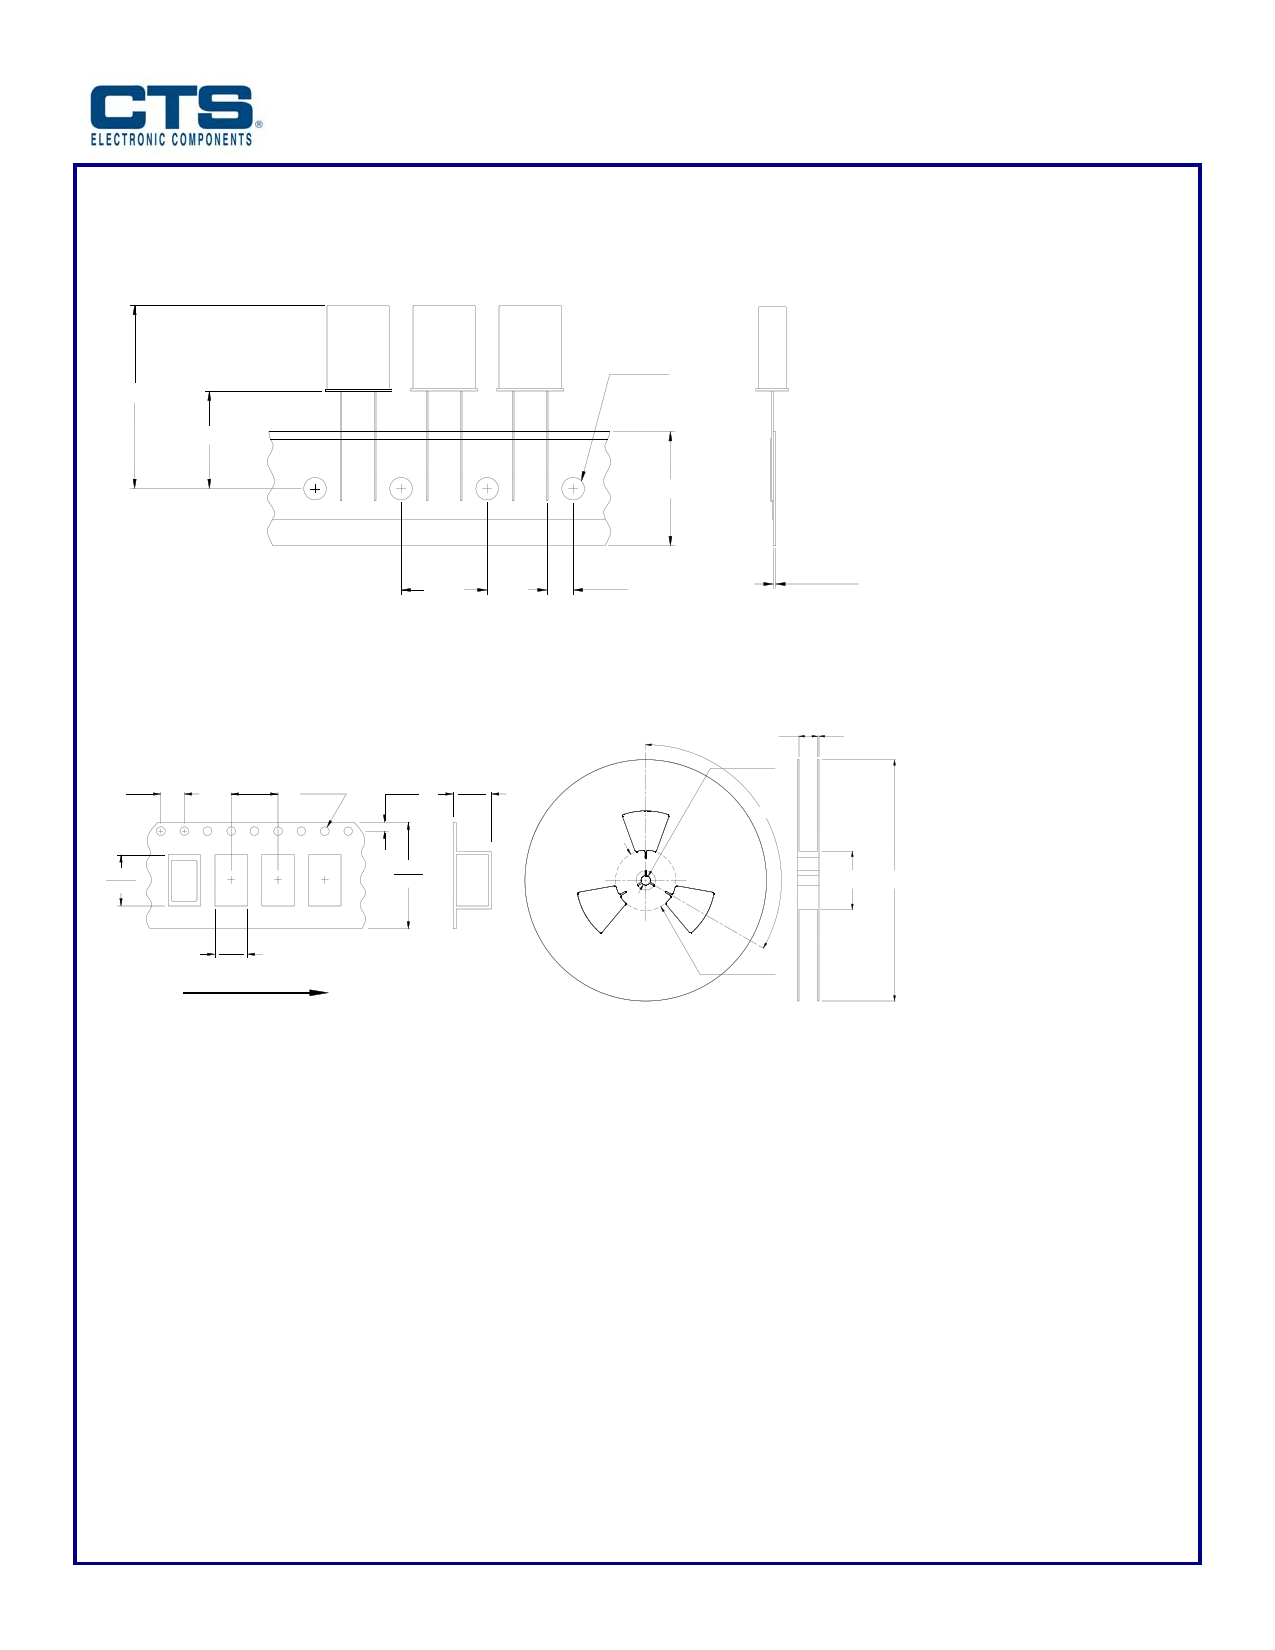 MP122B 電子部品, 半導体